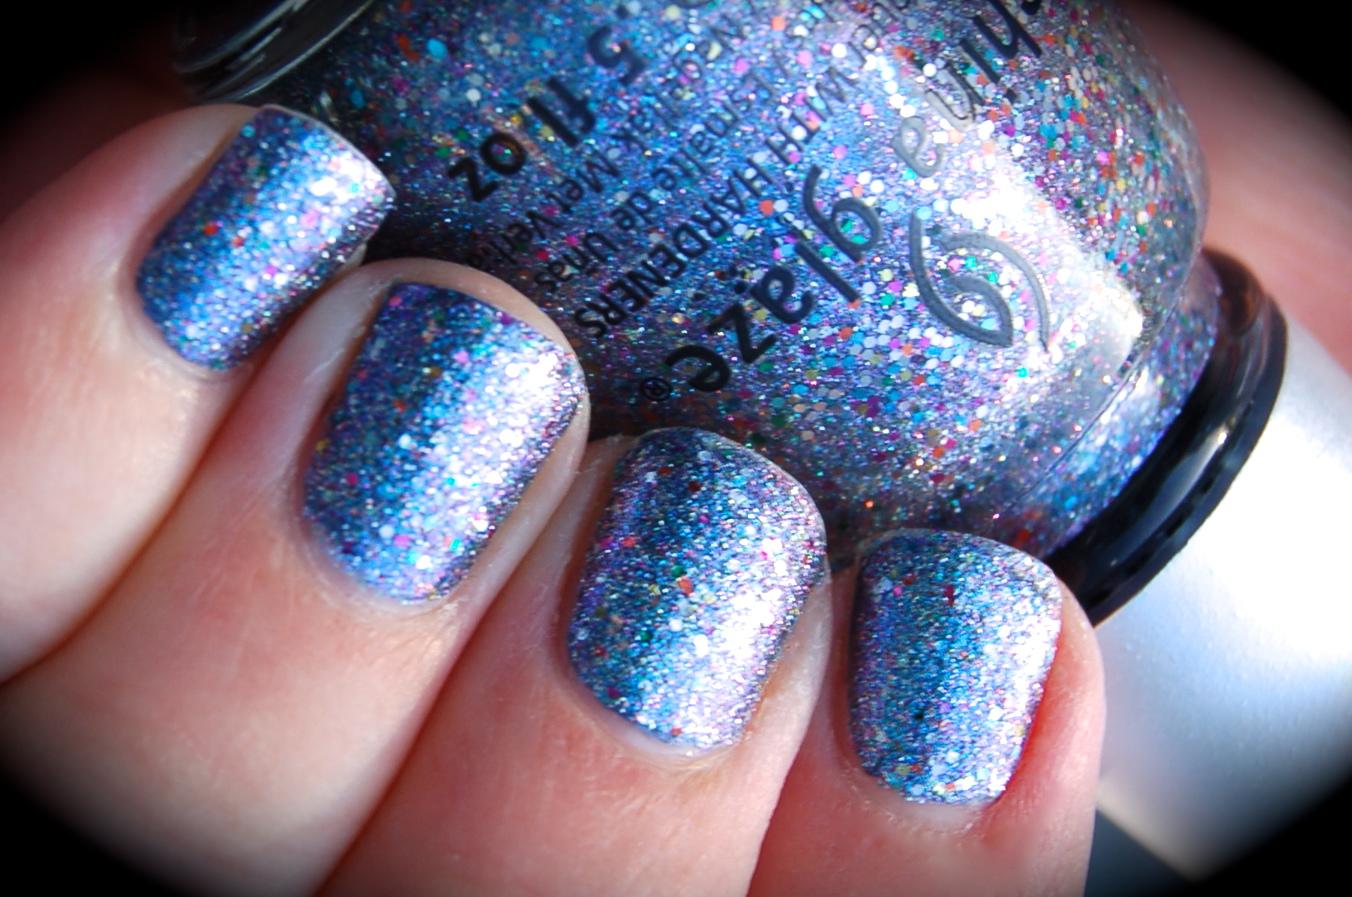 Swatch of China Glaze Liquid Crystal, Prismatic Chroma Glitters collection, bilder, nail polish, blogg nagellack